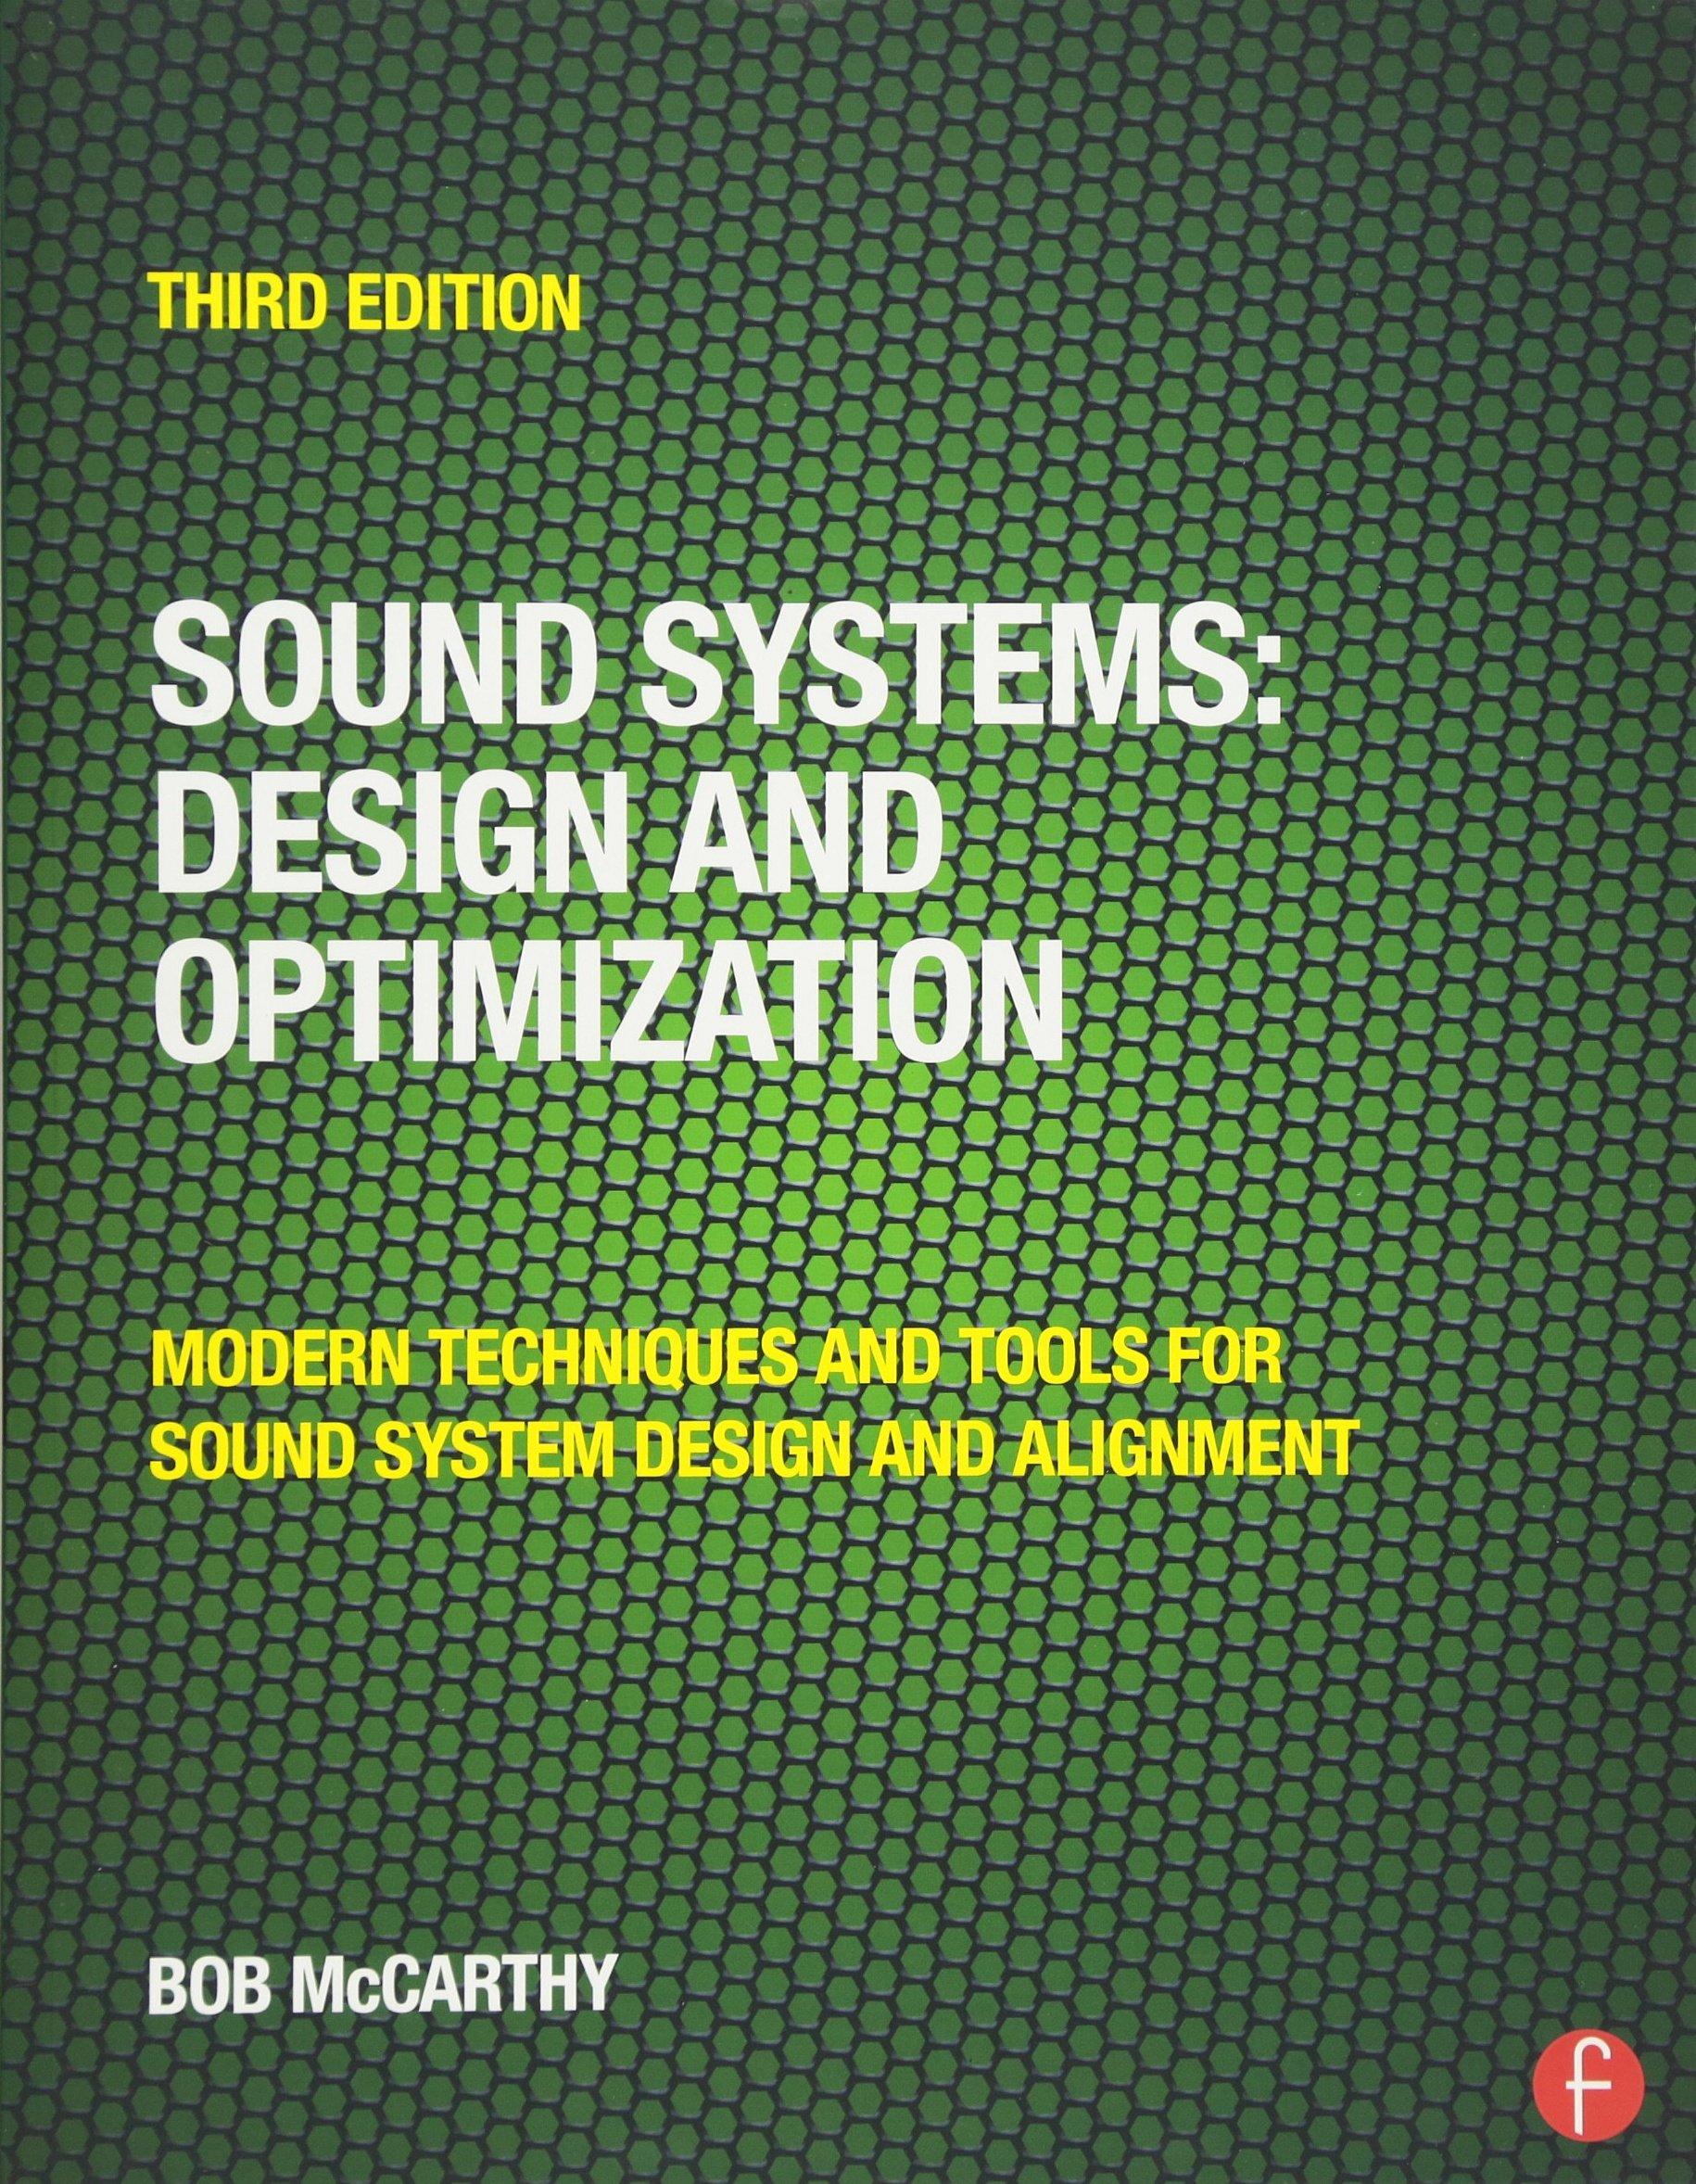 Sound Systems Design And Optimization Modern Techniques And Tools For Sound System Design And Alignment Mccarthy Bob 9780415731010 Amazon Com Books